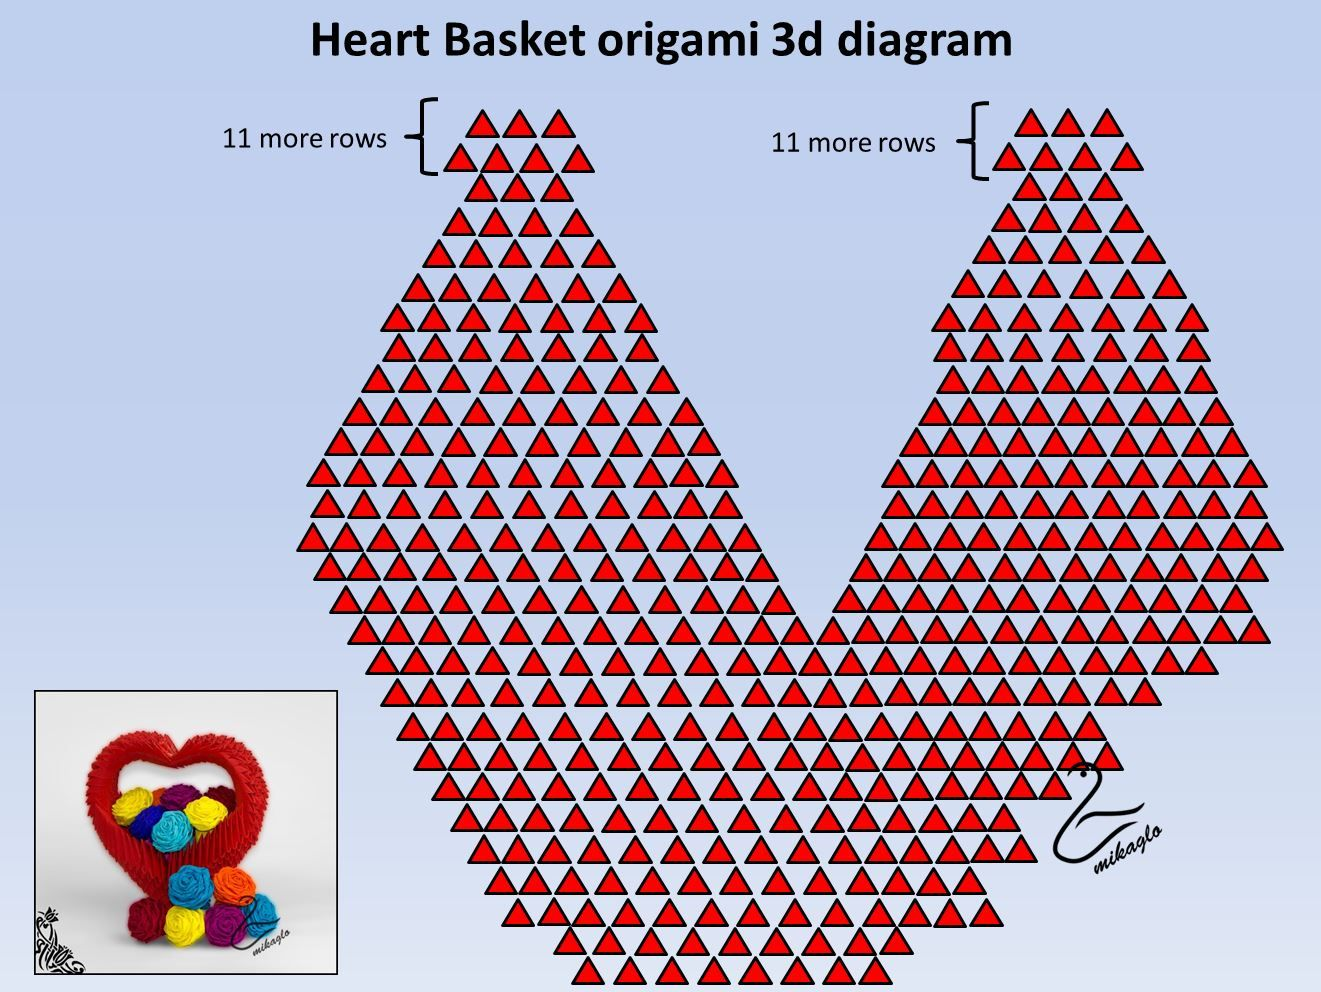 3d origami diagrams free google zoeken 3d origami pinterest 3d origami diagrams free google zoeken jeuxipadfo Gallery